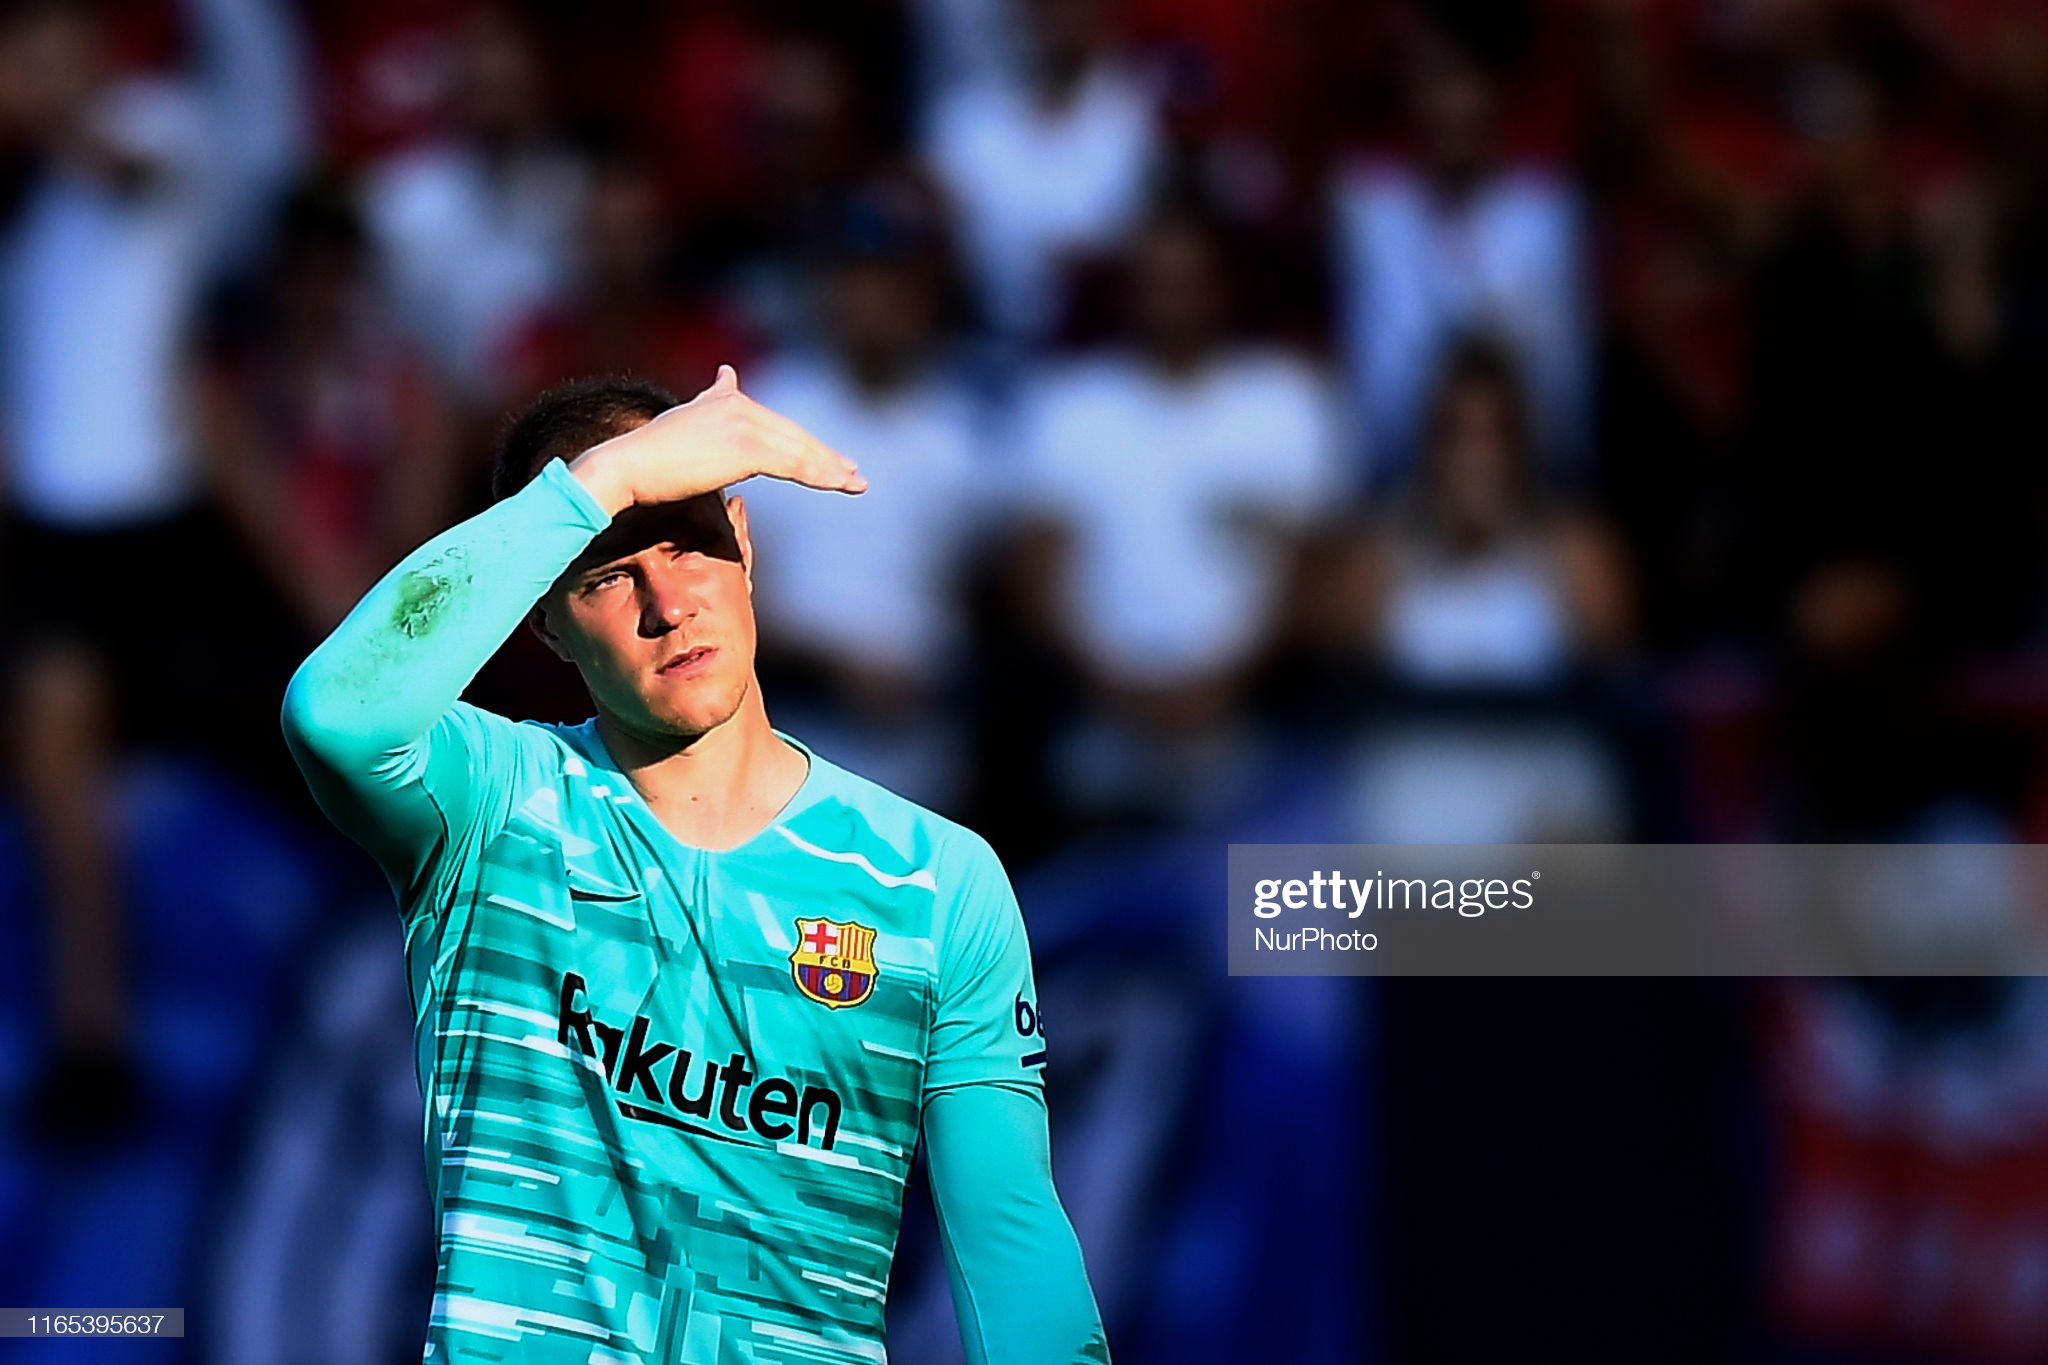 صور مباراة : أوساسونا - برشلونة 2-2 ( 31-08-2019 )  Andre-ter-stegen-of-barcelona-looks-on-during-the-liga-match-between-picture-id1165395637?s=2048x2048